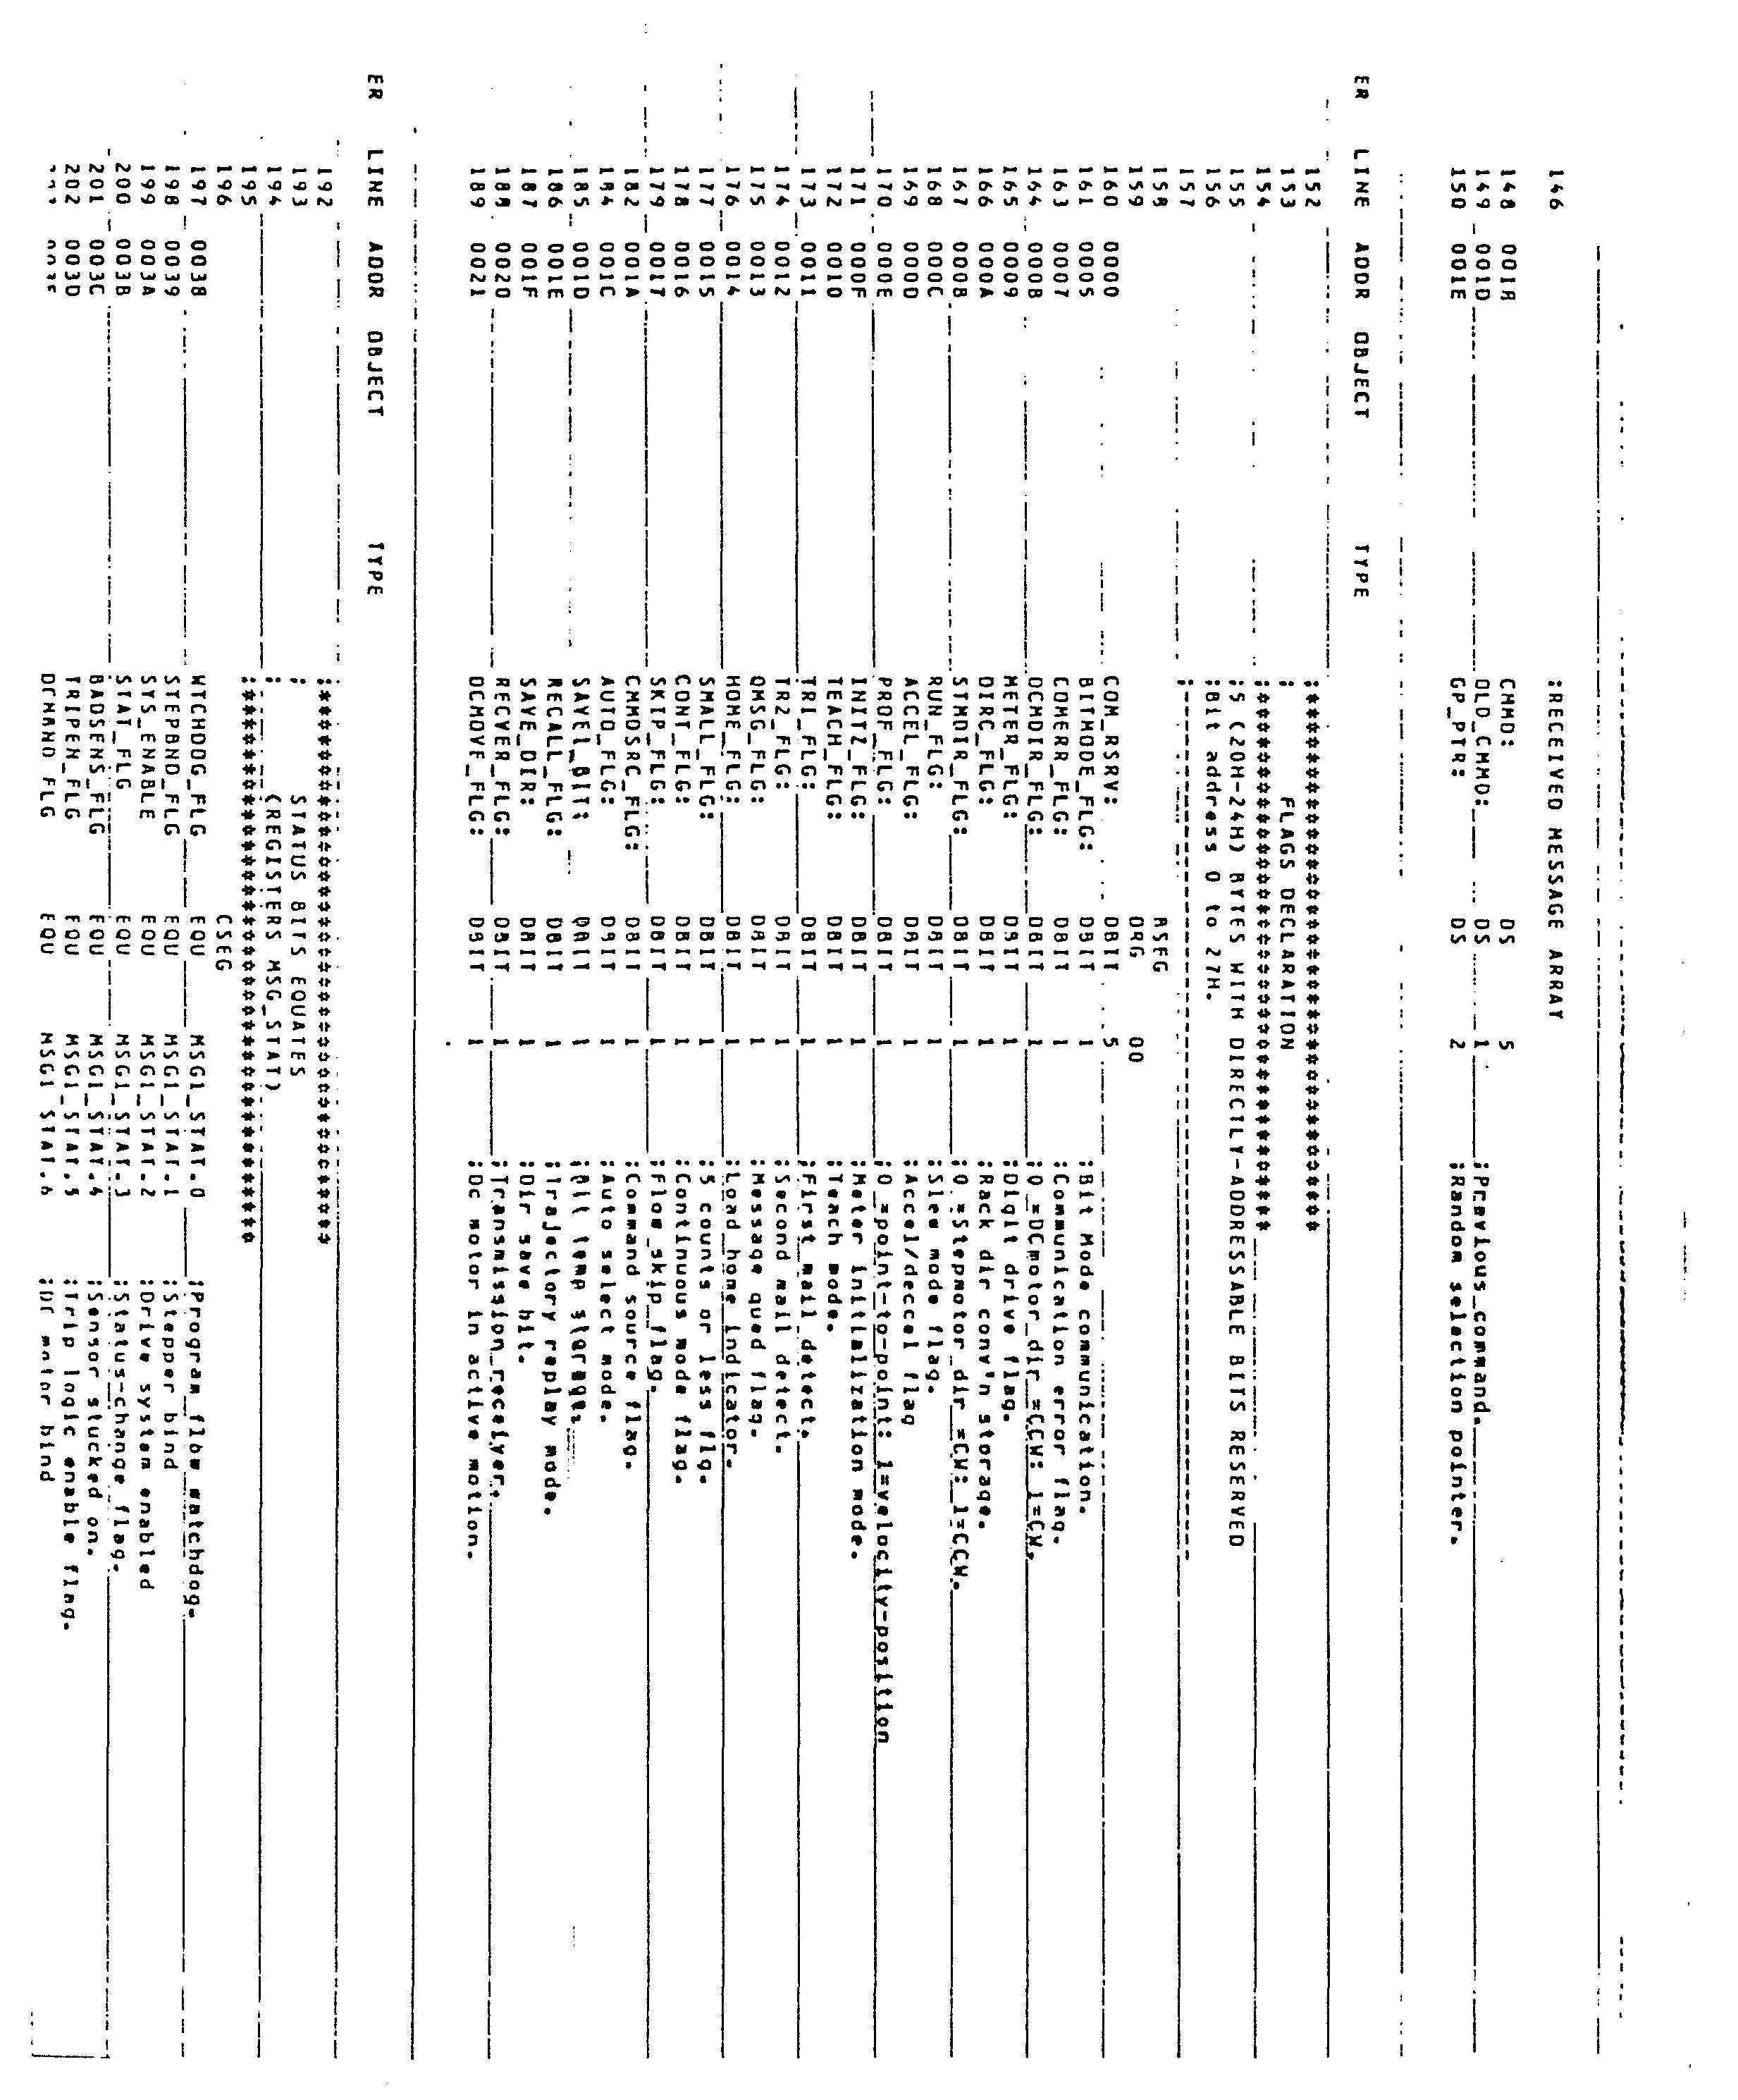 91A6B 159 69 3 193 Incremental Encoder Meter Wiring Diagram | Wiring LibraryWiring Library